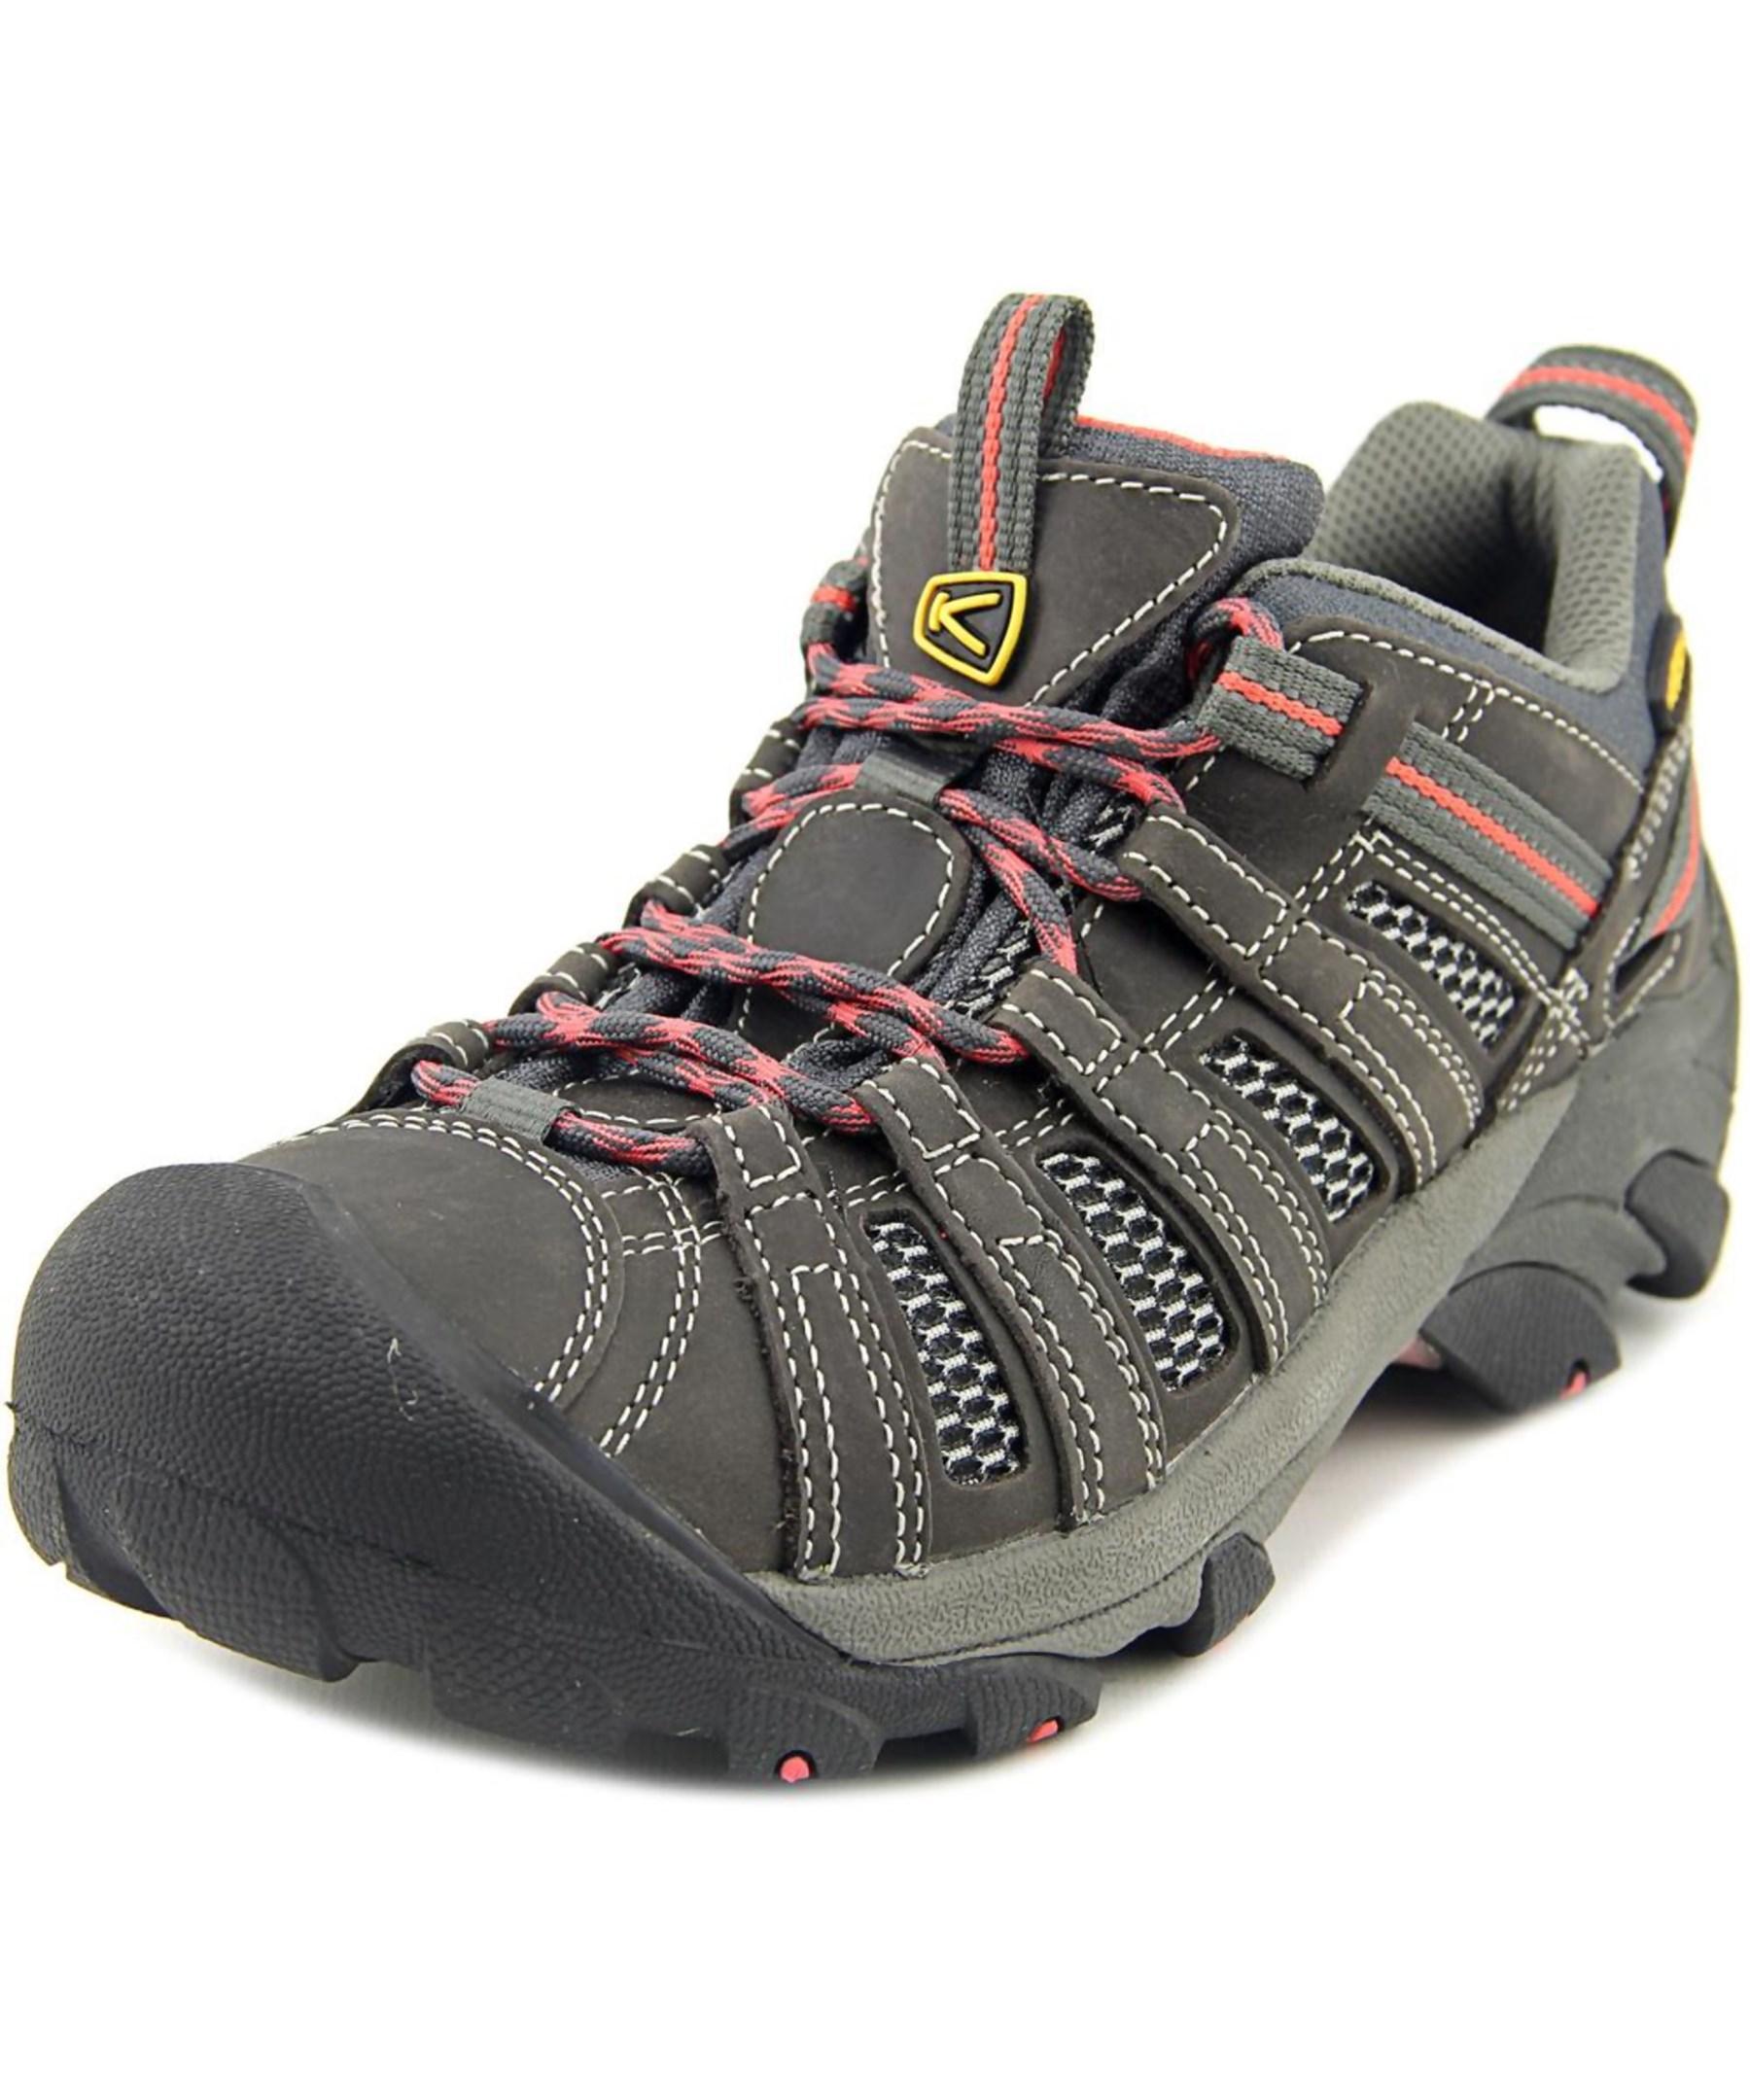 Ecco Shoes Thailand